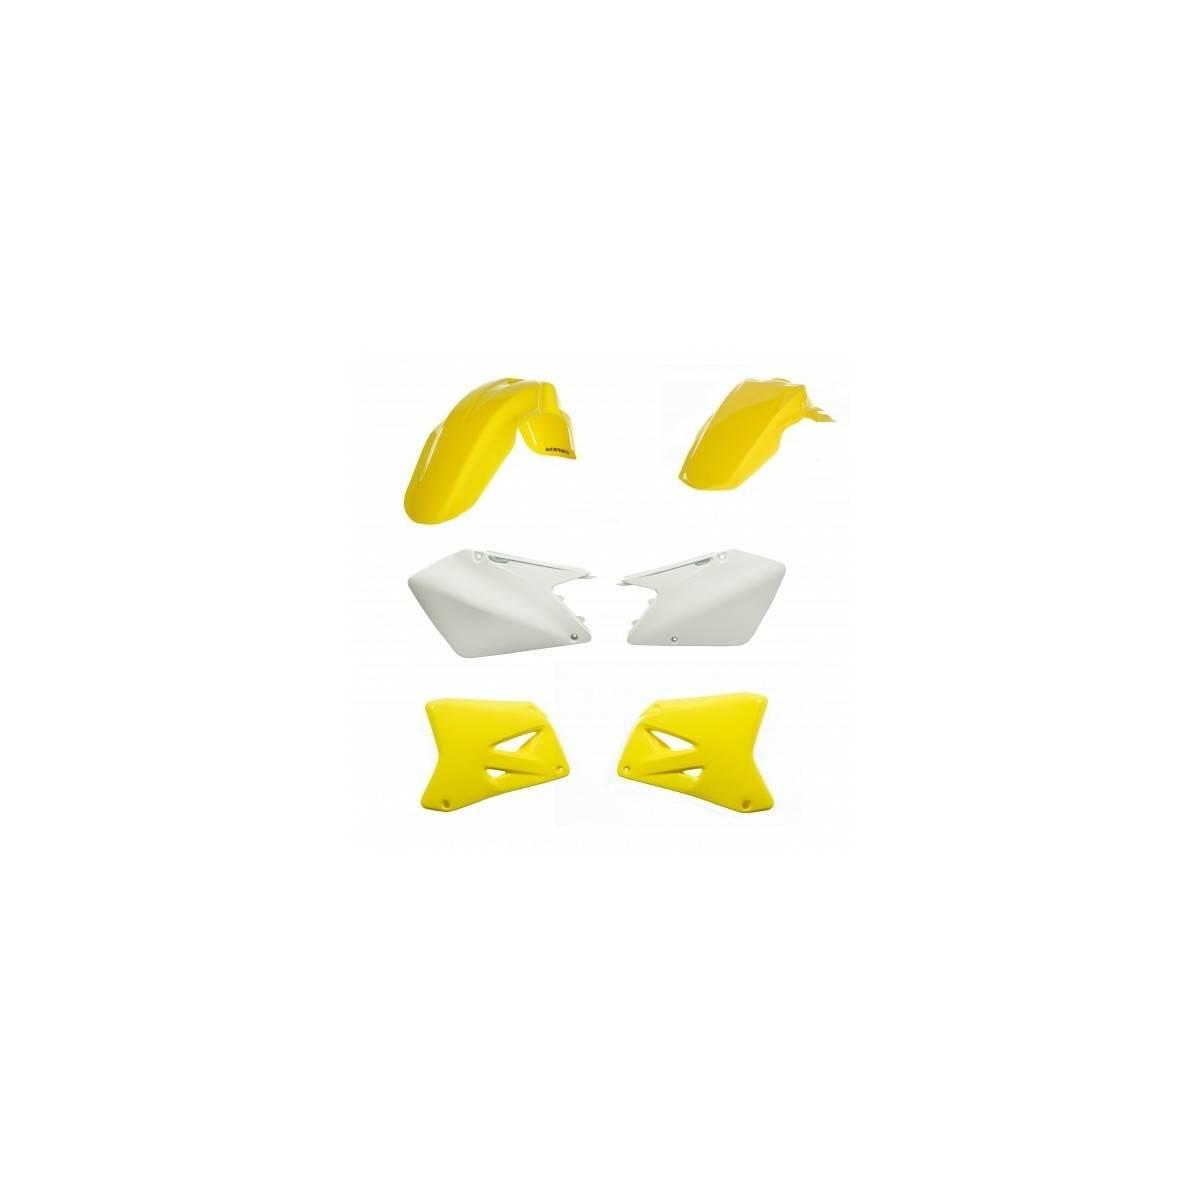 0007527-061 - Kit Plasticos Crf450 02 03 Amarillo Fluor